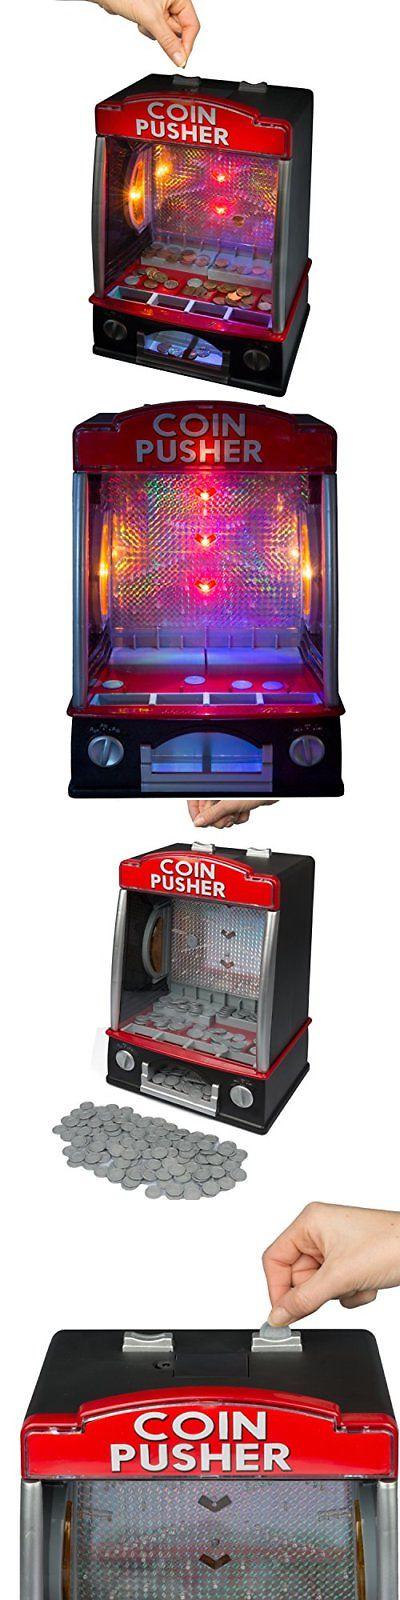 Electronic Games 2540: Mini Arcade Machine - Electronic ...